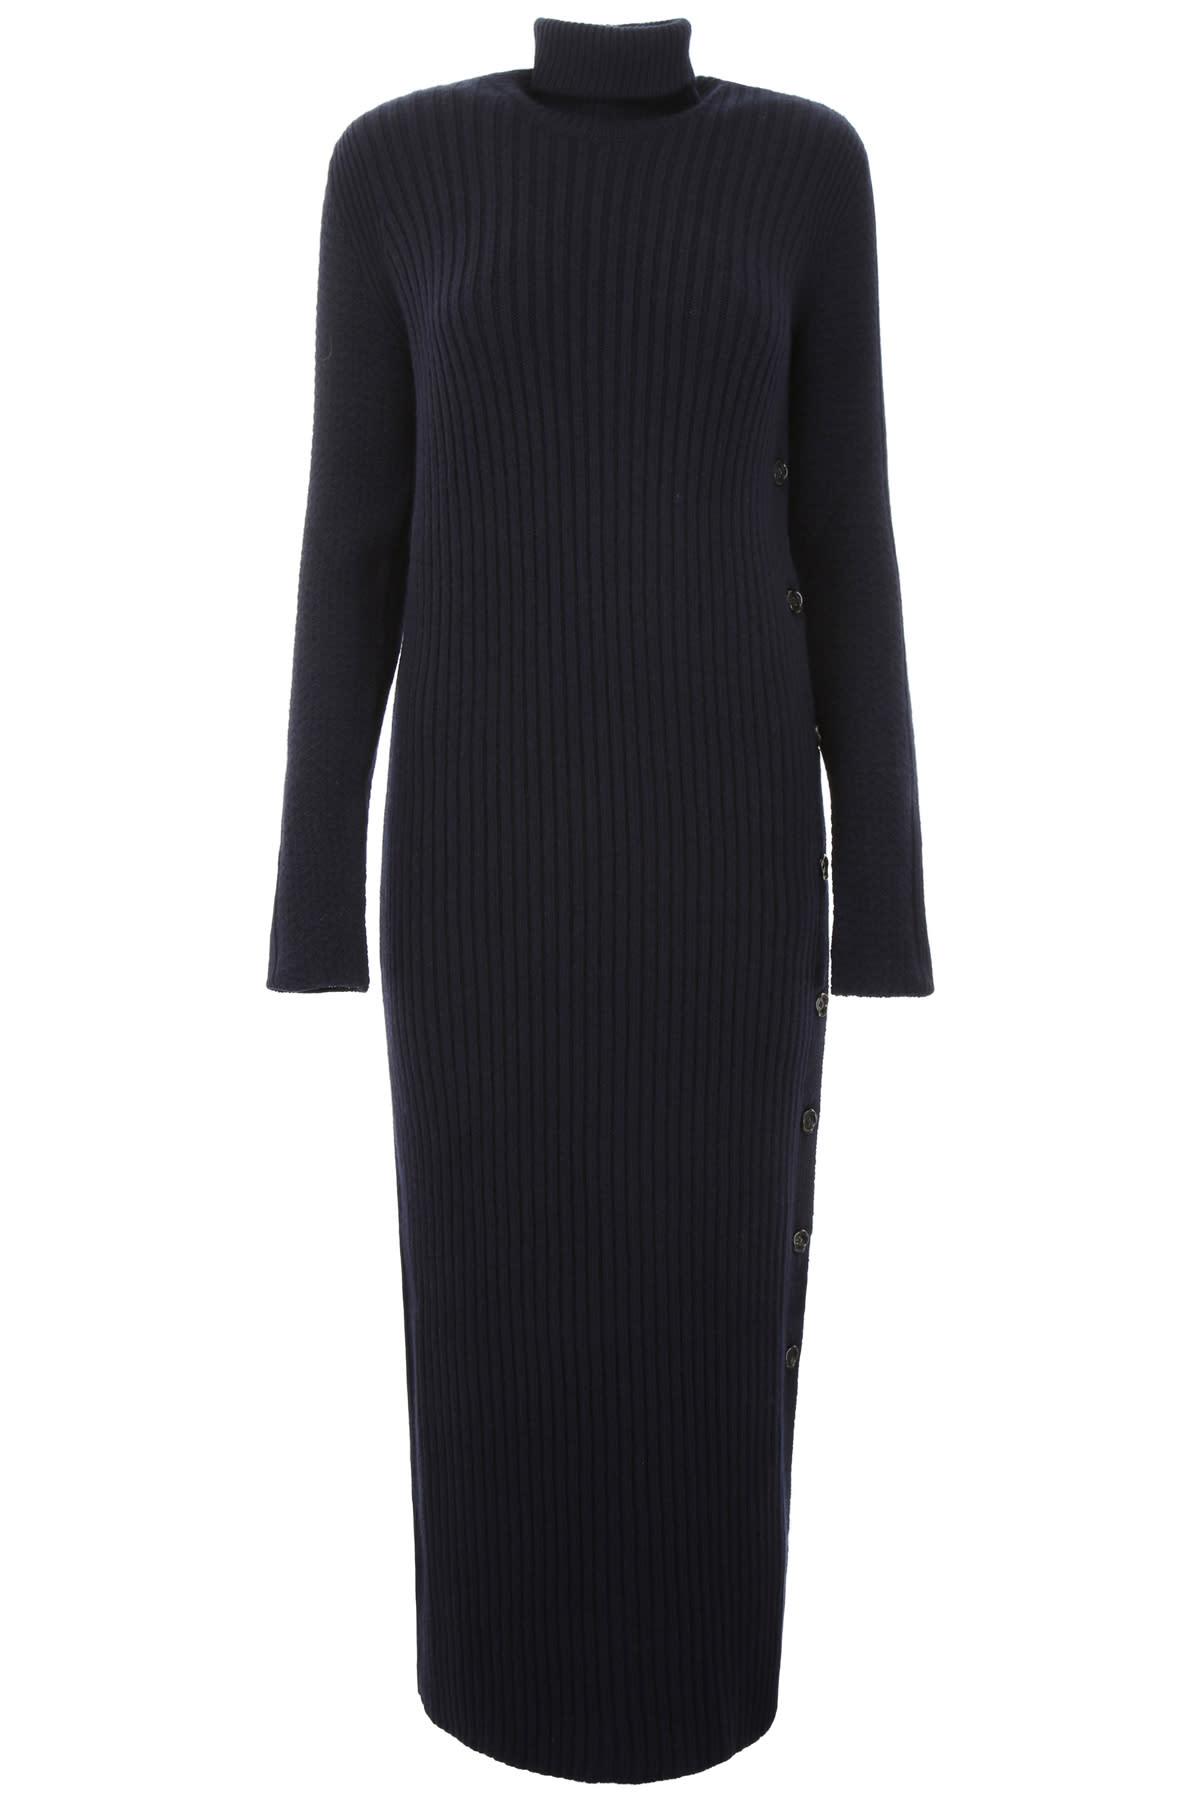 Buy Marni Virgin Wool Dress online, shop Marni with free shipping